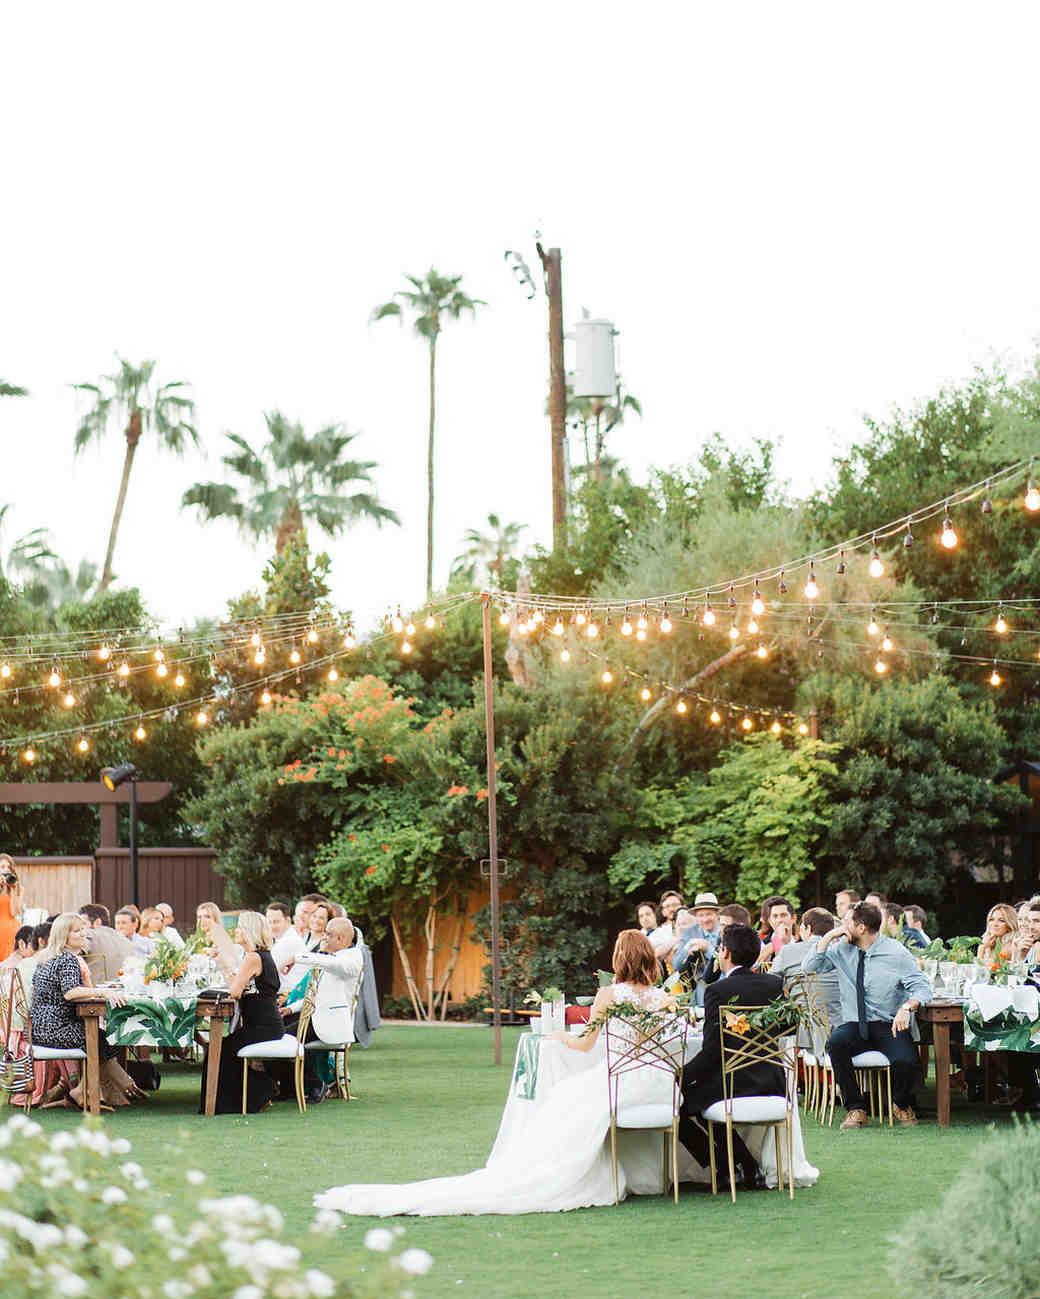 emily adhir wedding reception lighted